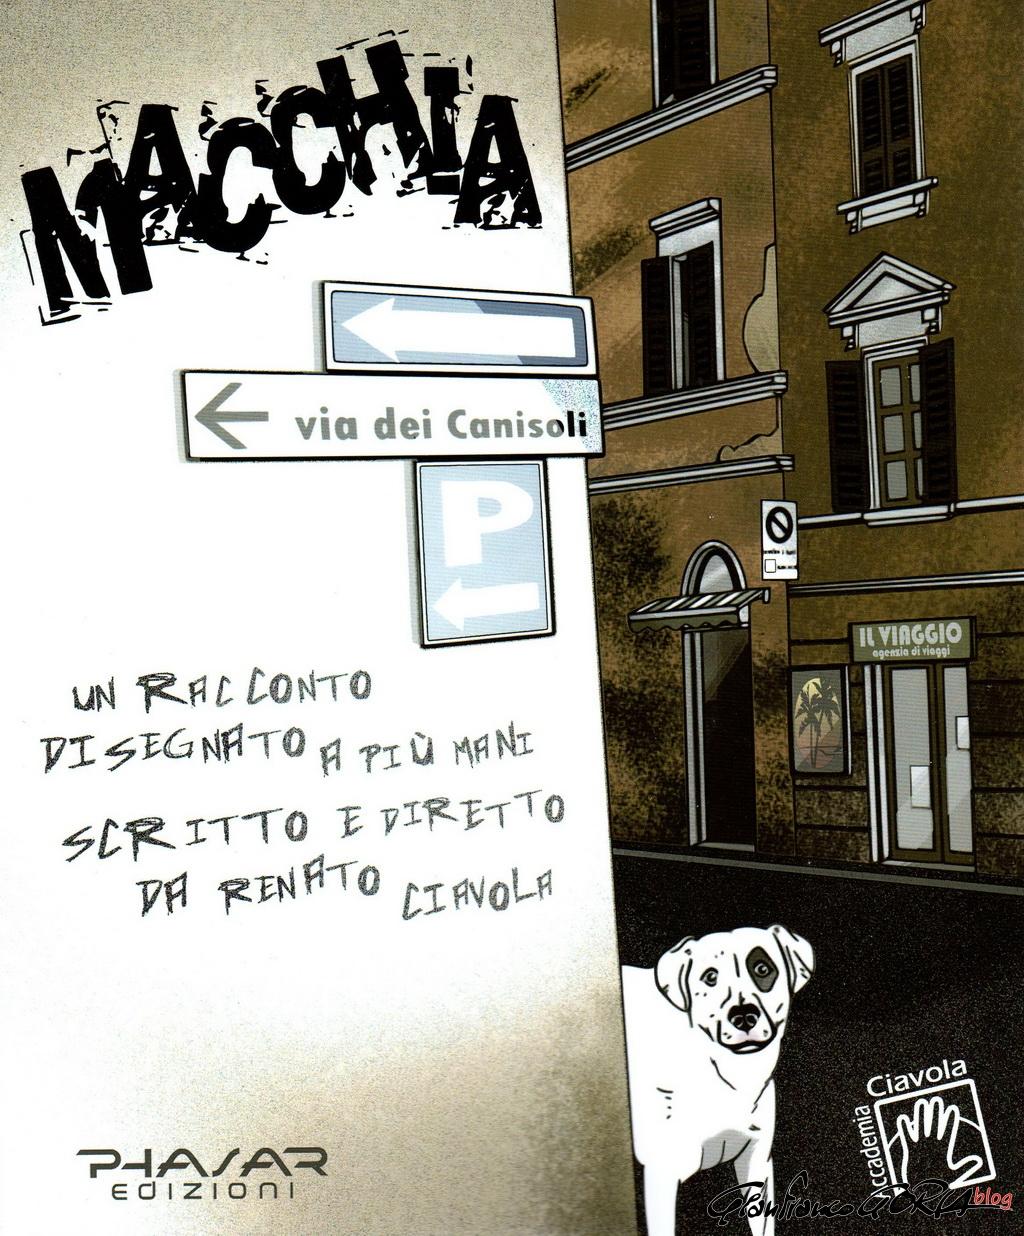 MacchiaCiavola